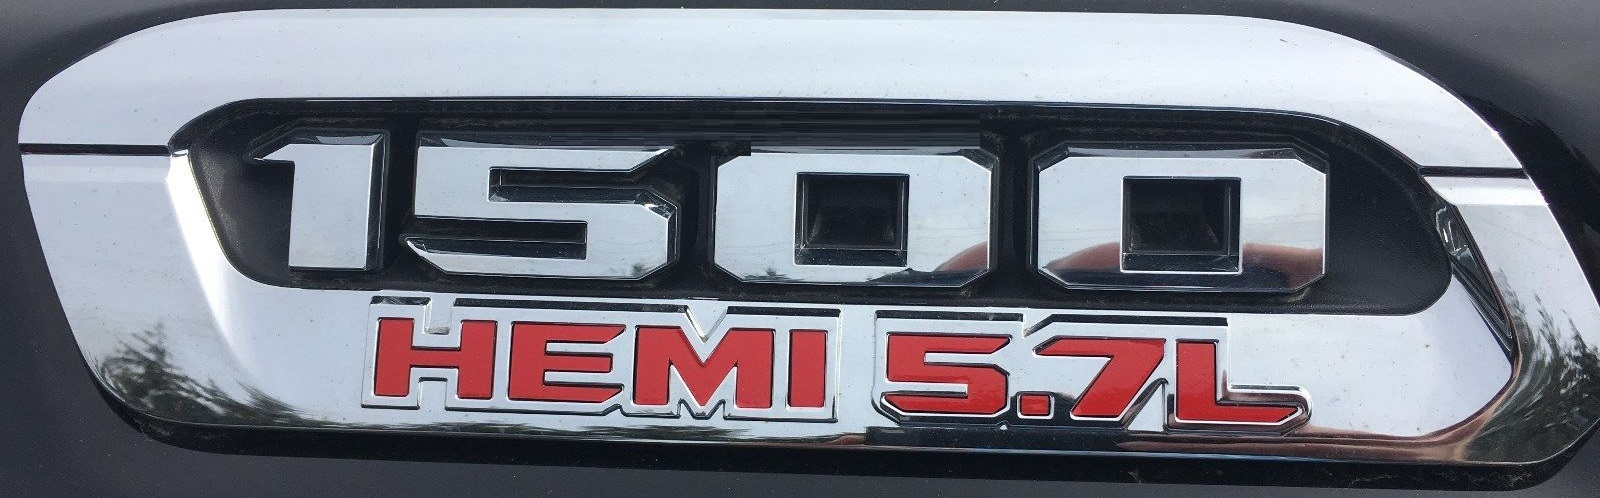 2019 Ram Rebel Badge Inlay Decal Sticker